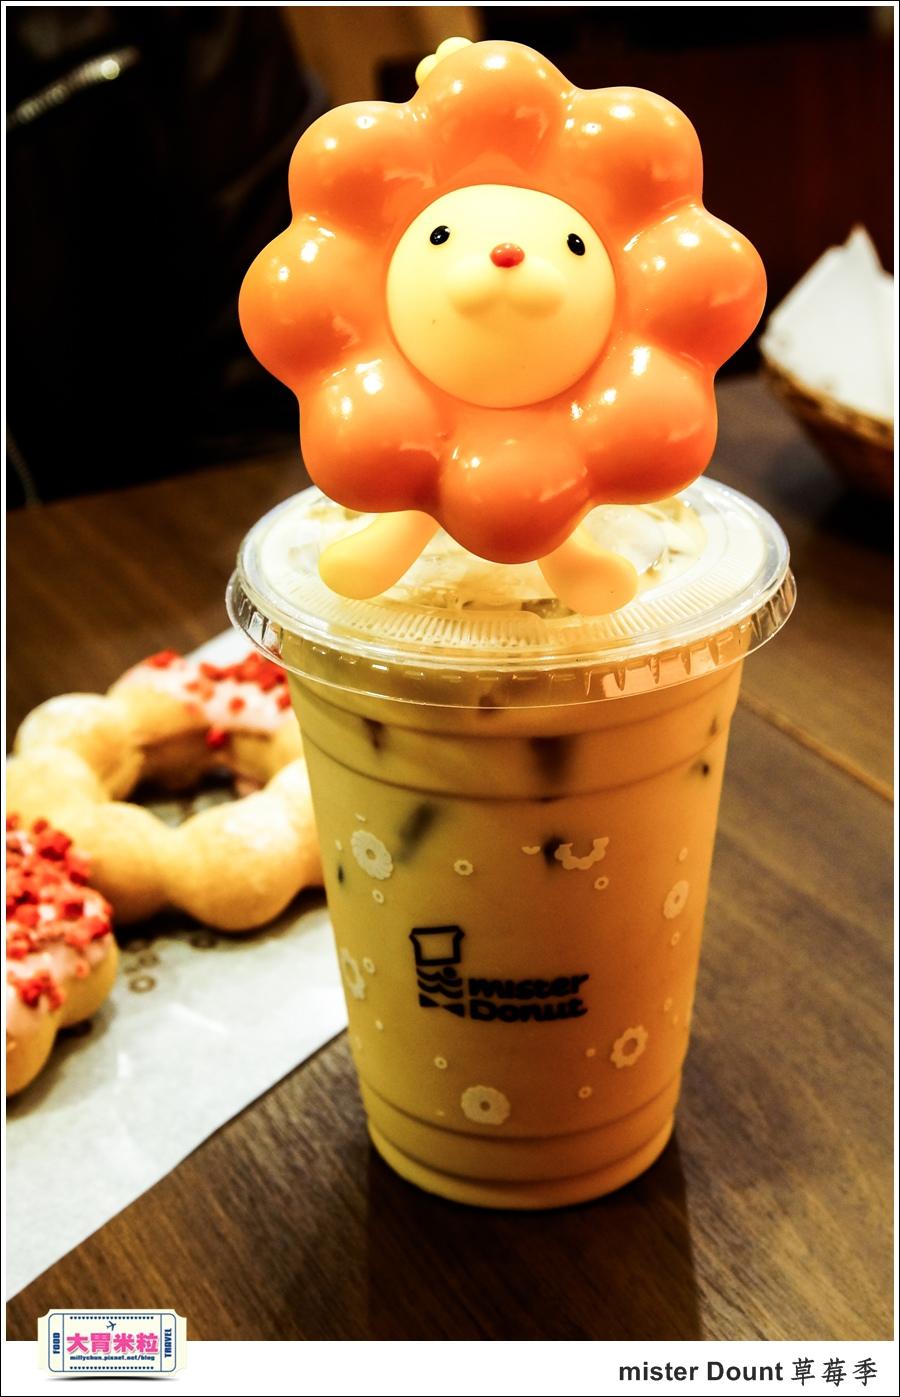 mister Dounth草莓季甜甜圈推薦@大胃米粒0034.jpg